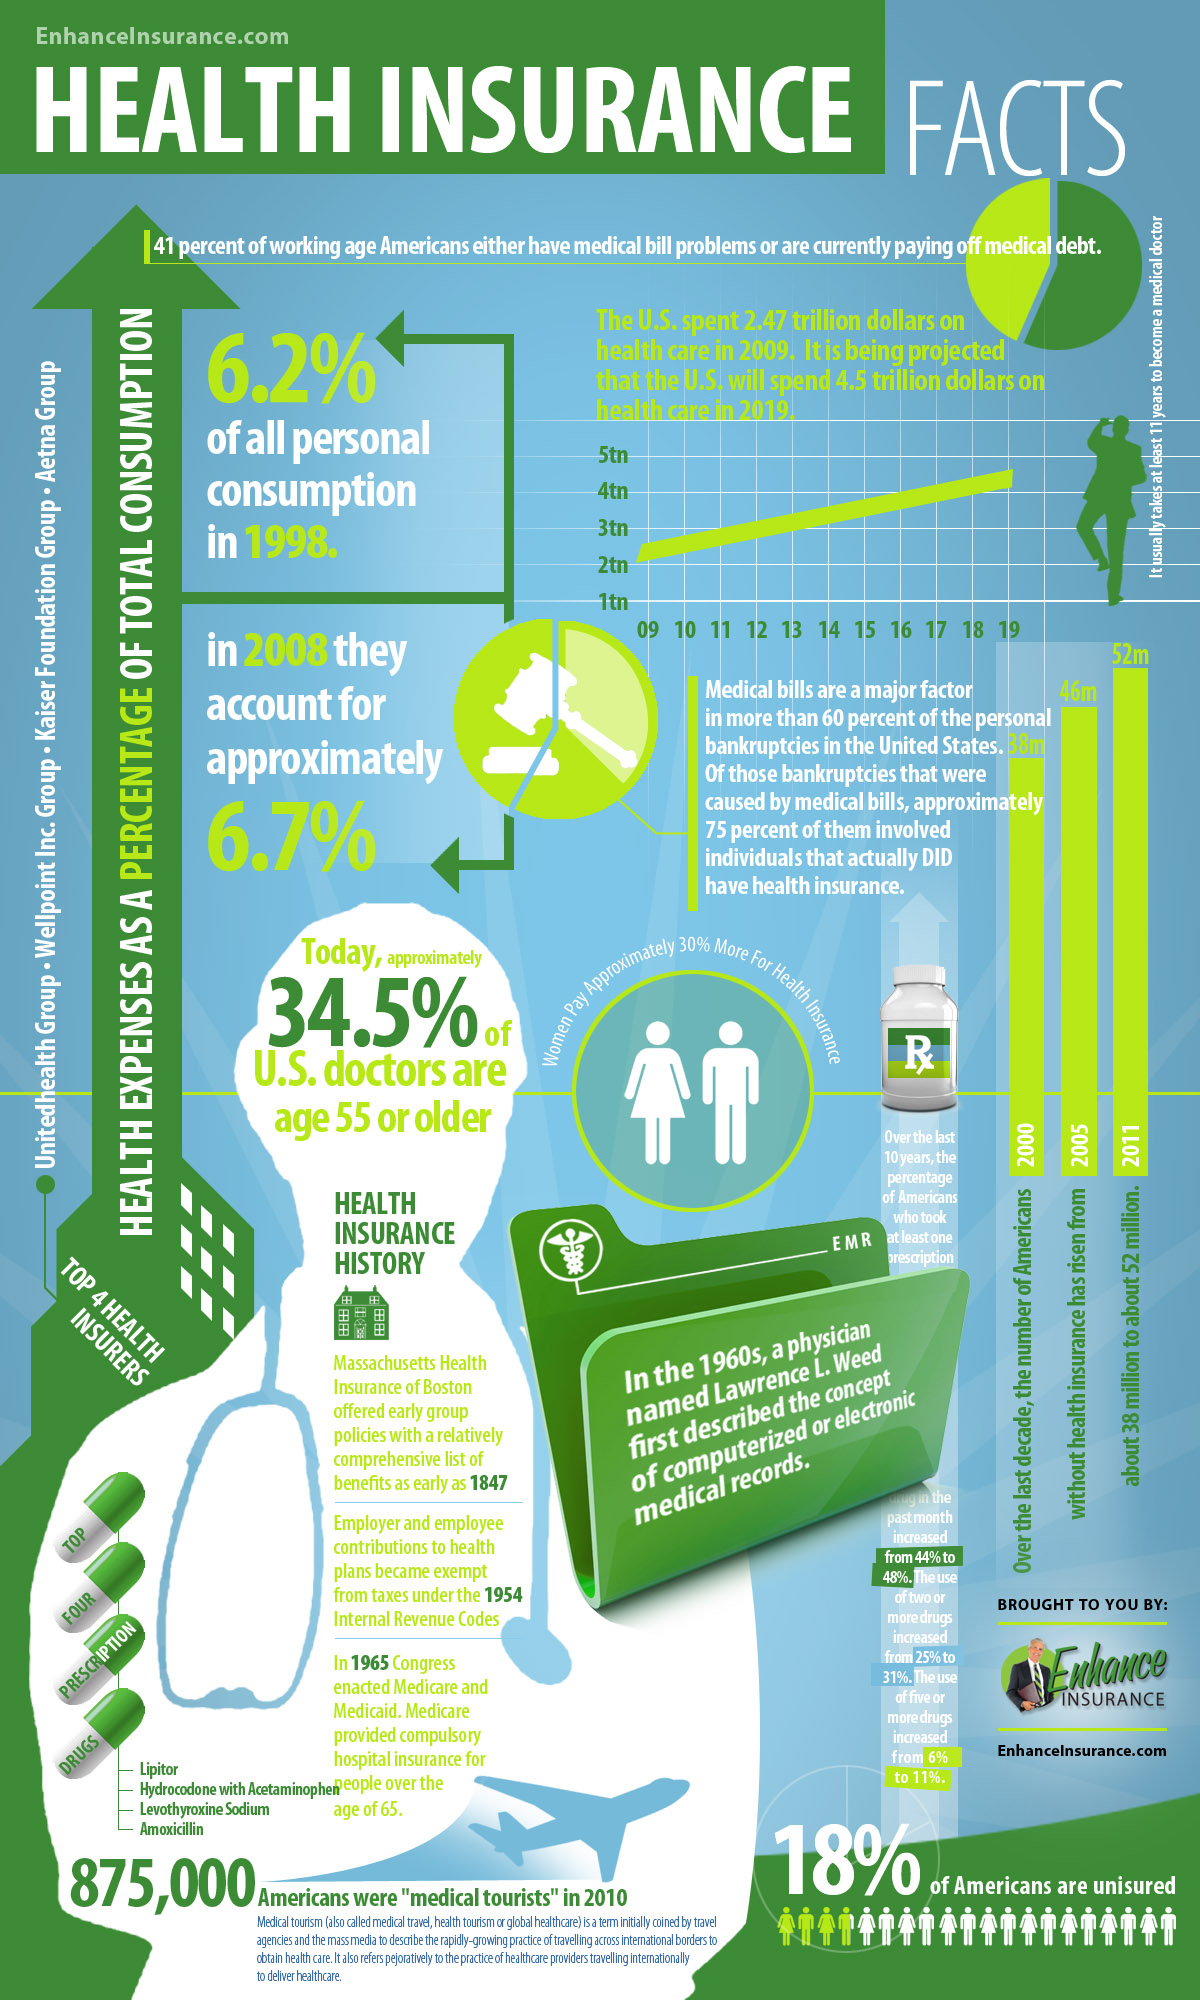 health-insurance-facts--statistics-infographic_50ef218fc665b